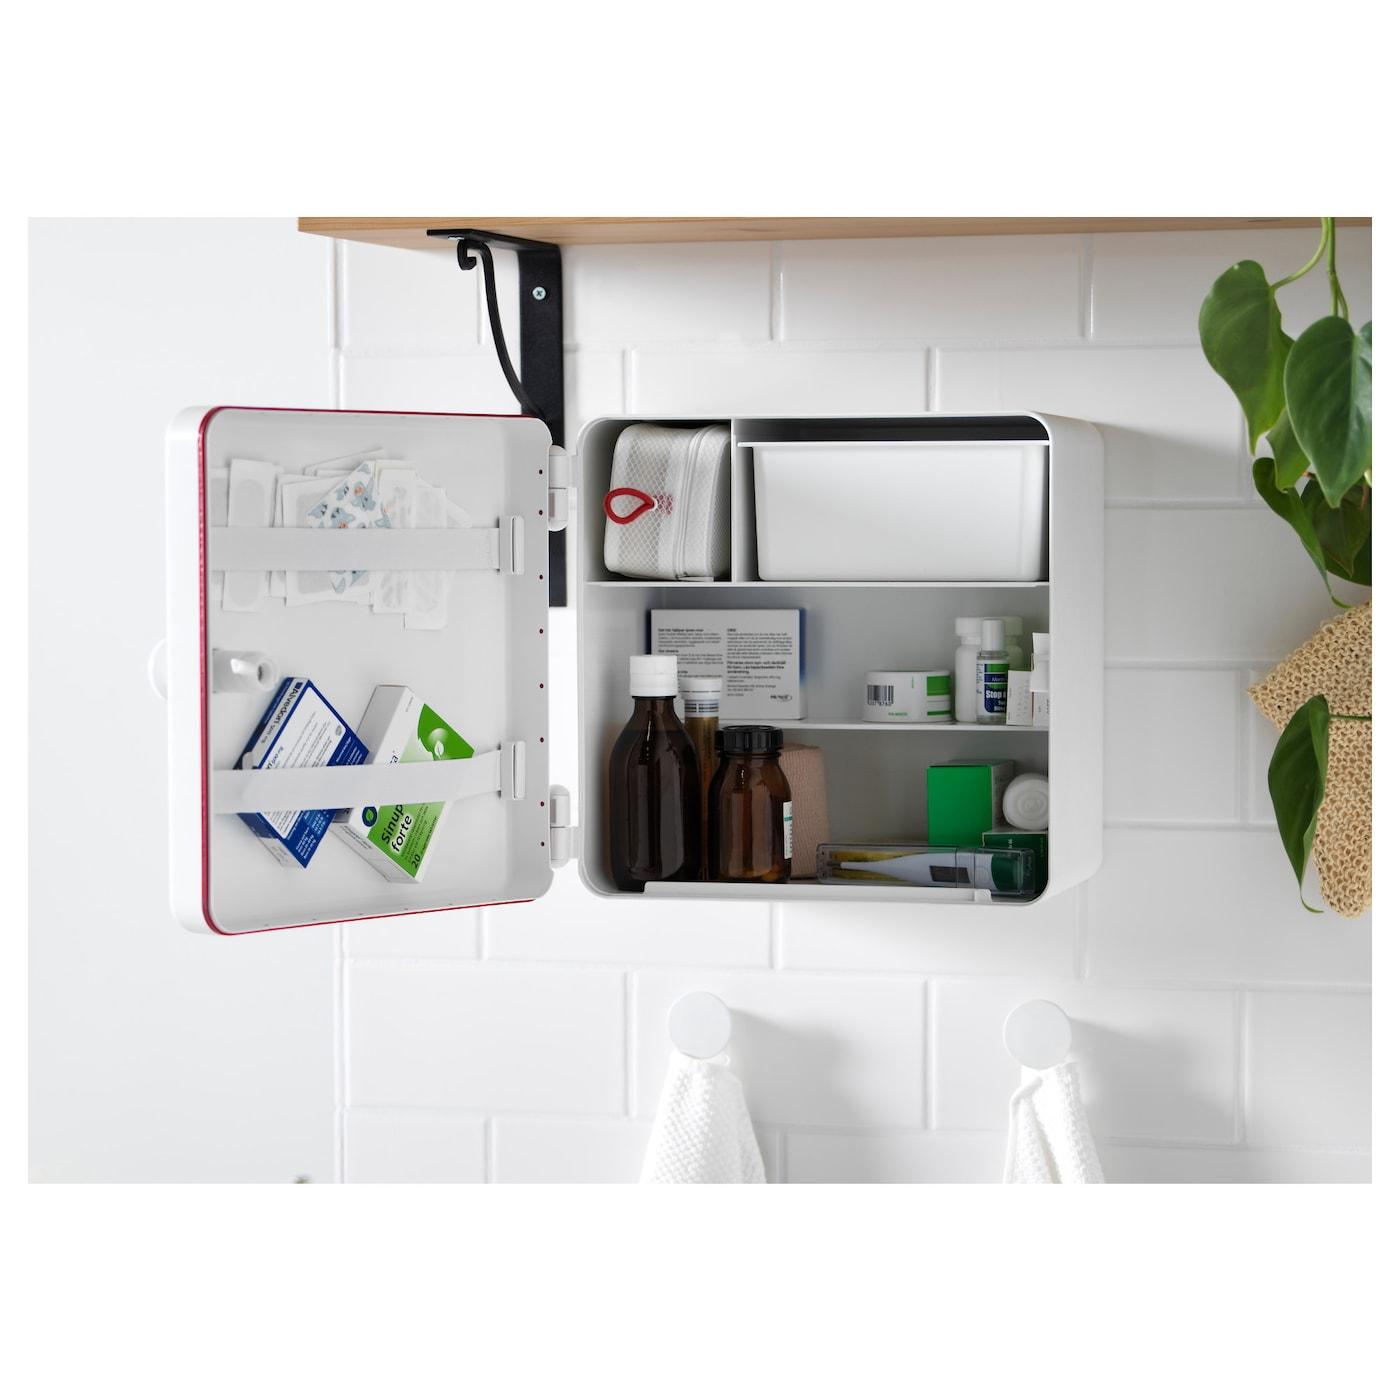 trygghet medicine cabinet ikea. Black Bedroom Furniture Sets. Home Design Ideas